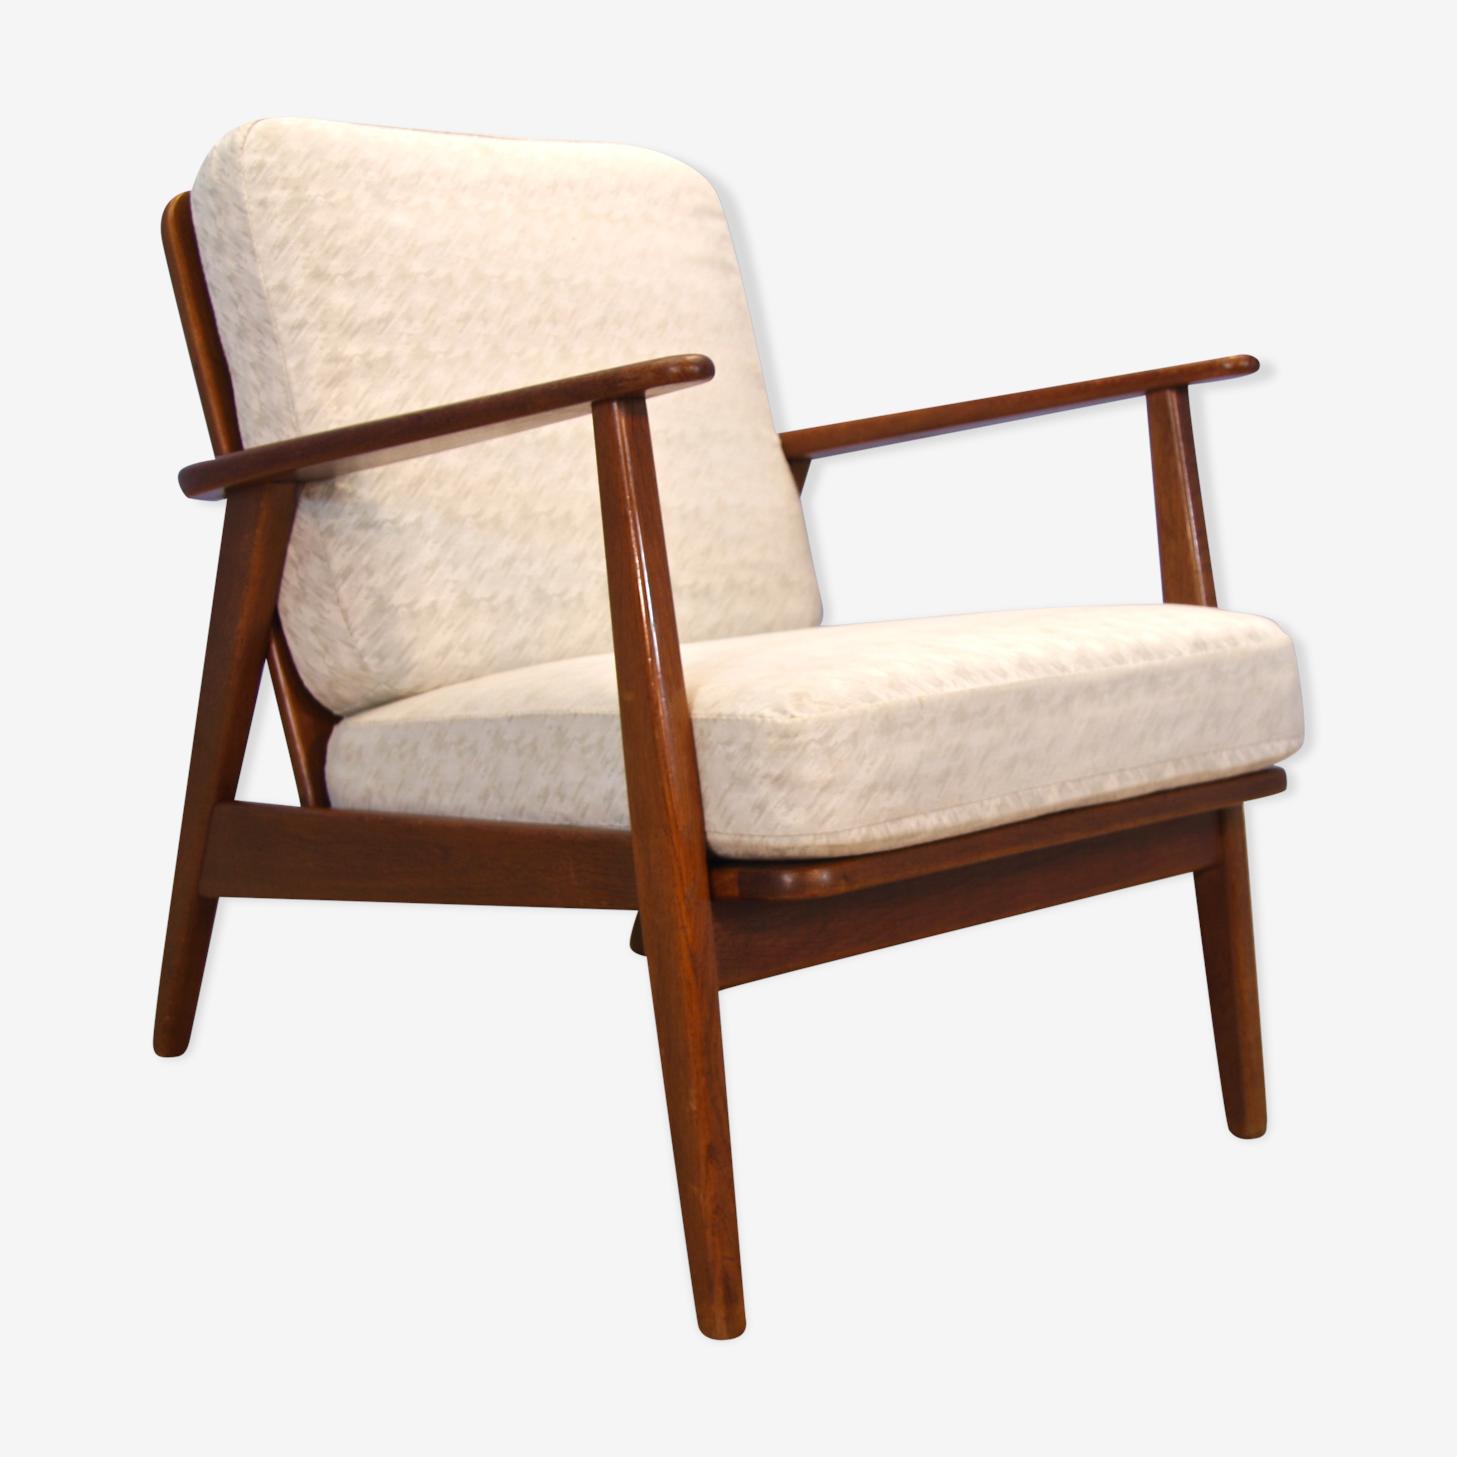 Danish lounge chair in teak, 1960